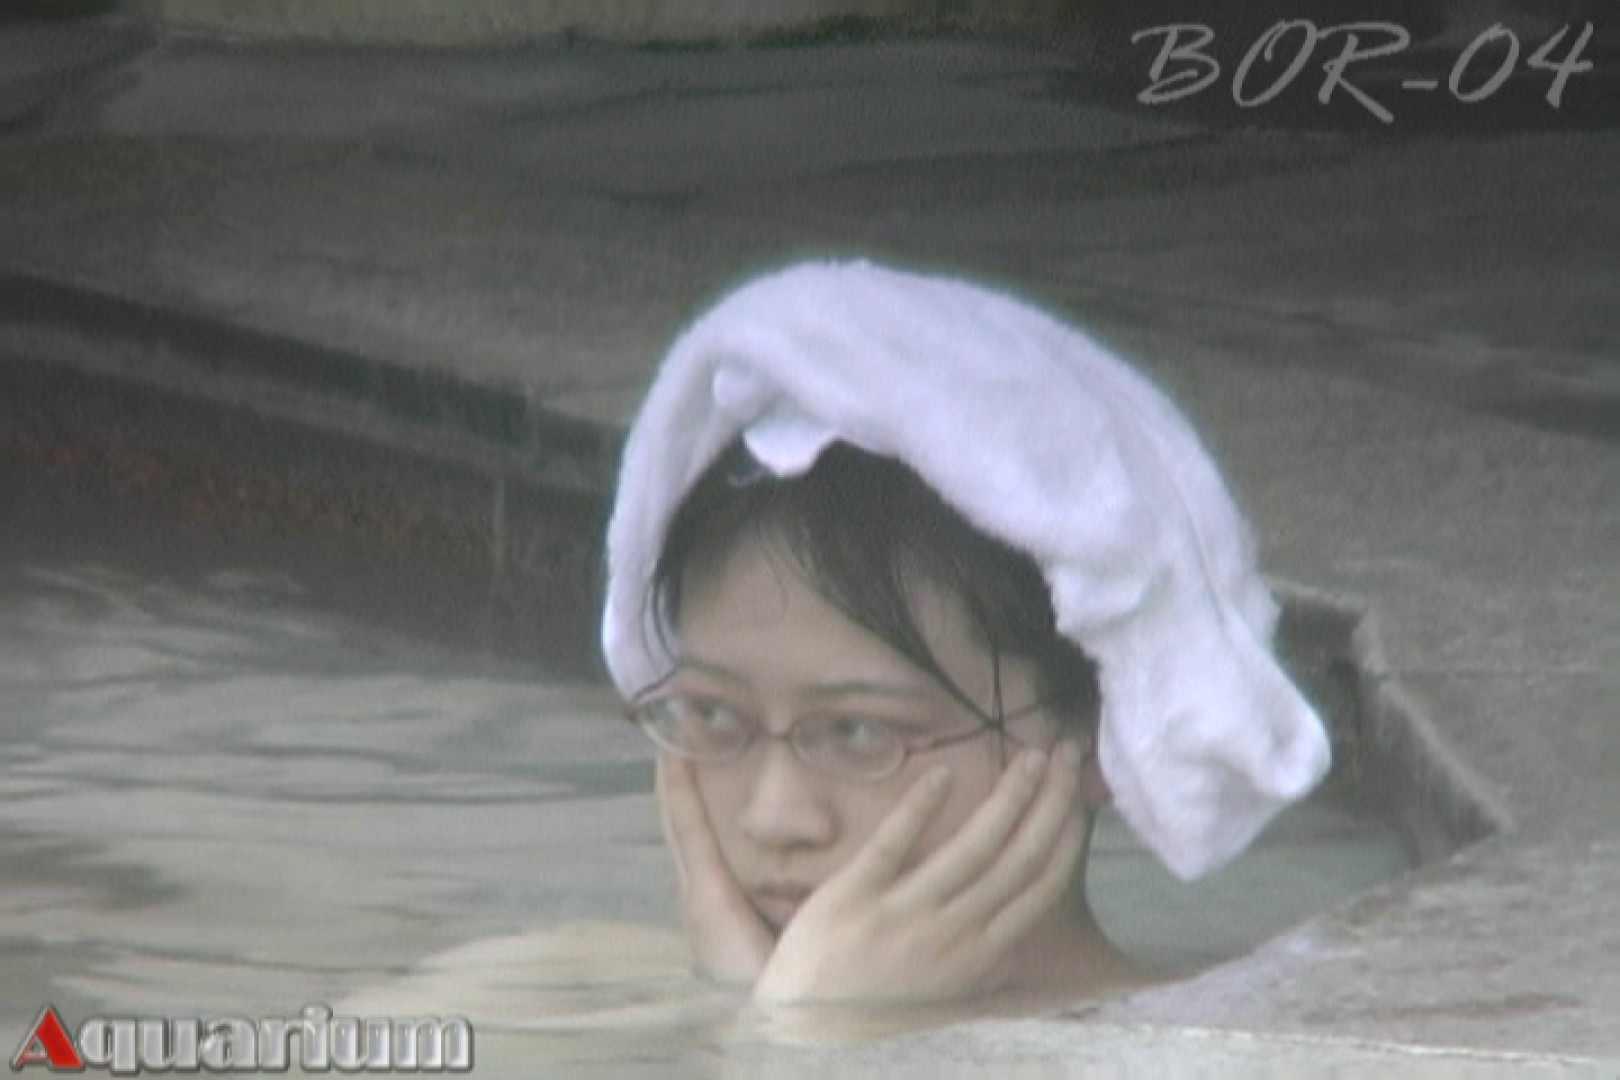 Aquaな露天風呂Vol.507 露天 ワレメ無修正動画無料 84画像 74